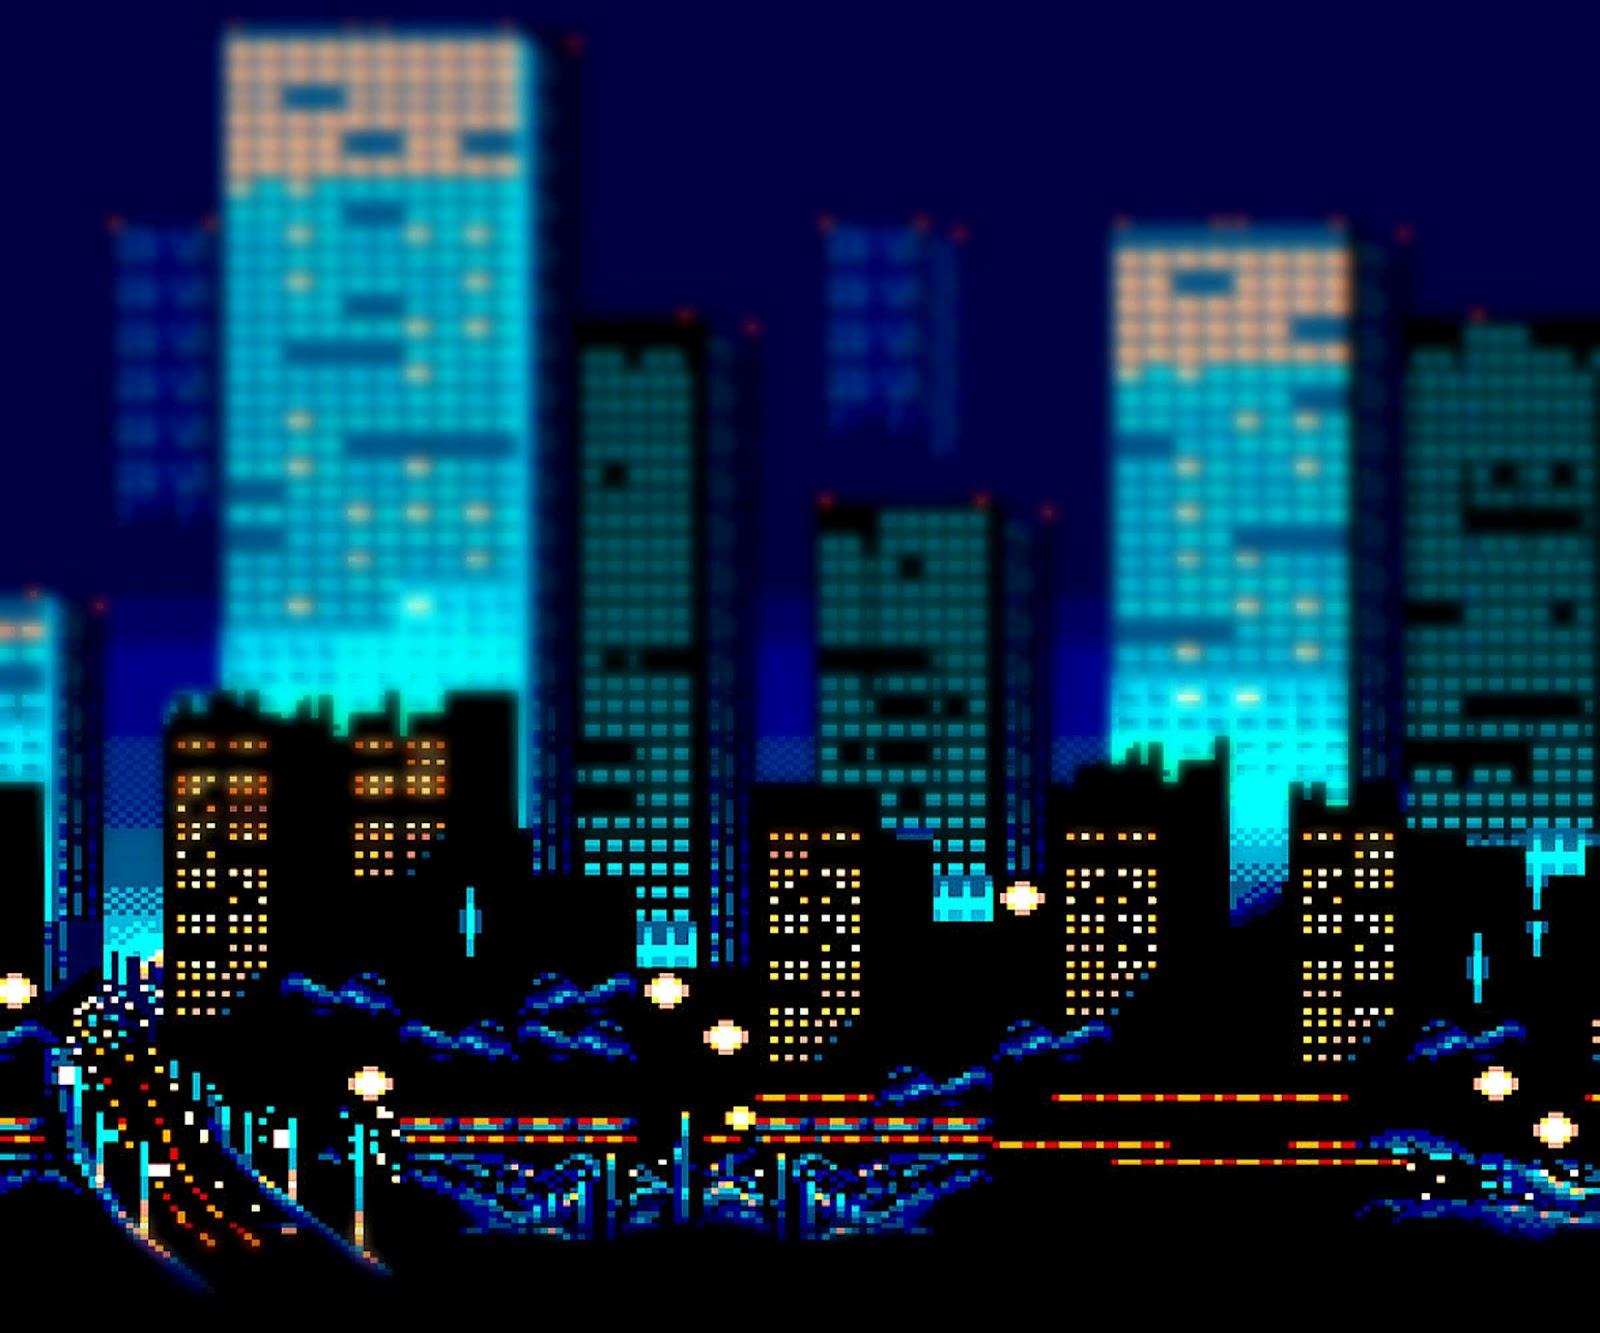 16 Bit City Background Spyder acidburn android wallpaper   8 bit 1600x1333